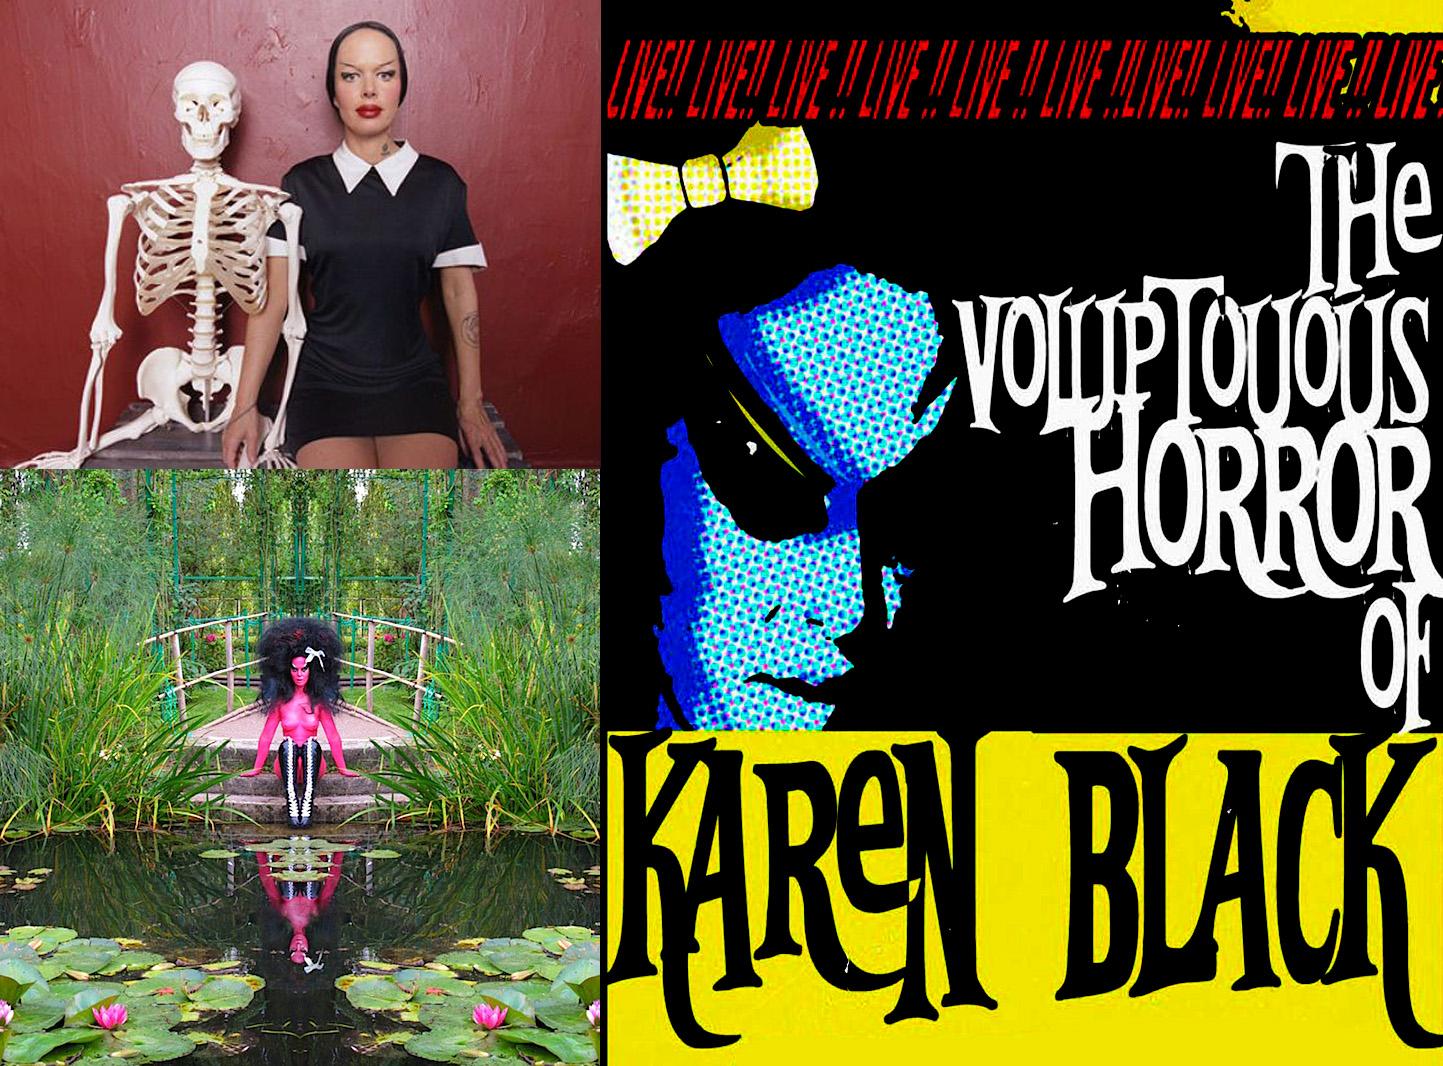 the_voluptuous_horror_of_karen_black_by_andy2519-d98xew2.jpg